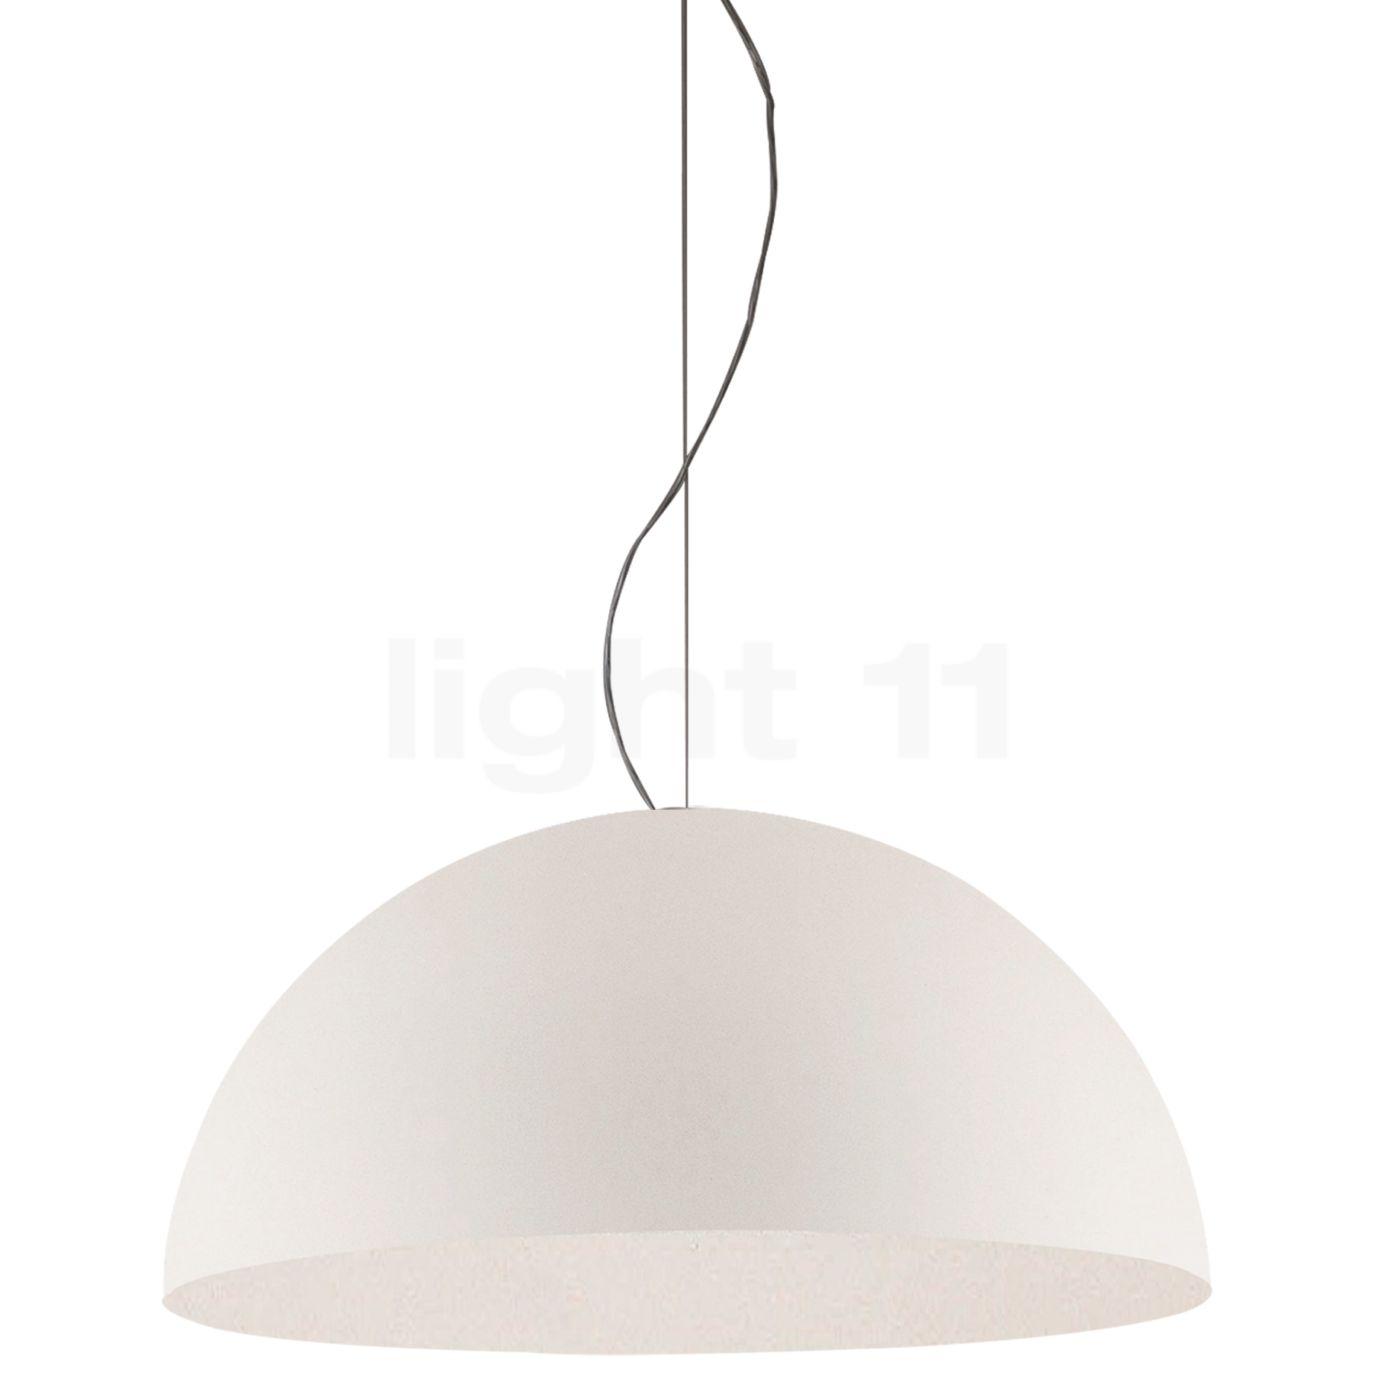 Oluce Sonora XL Pendelleuchte, opalglas L0493 BI